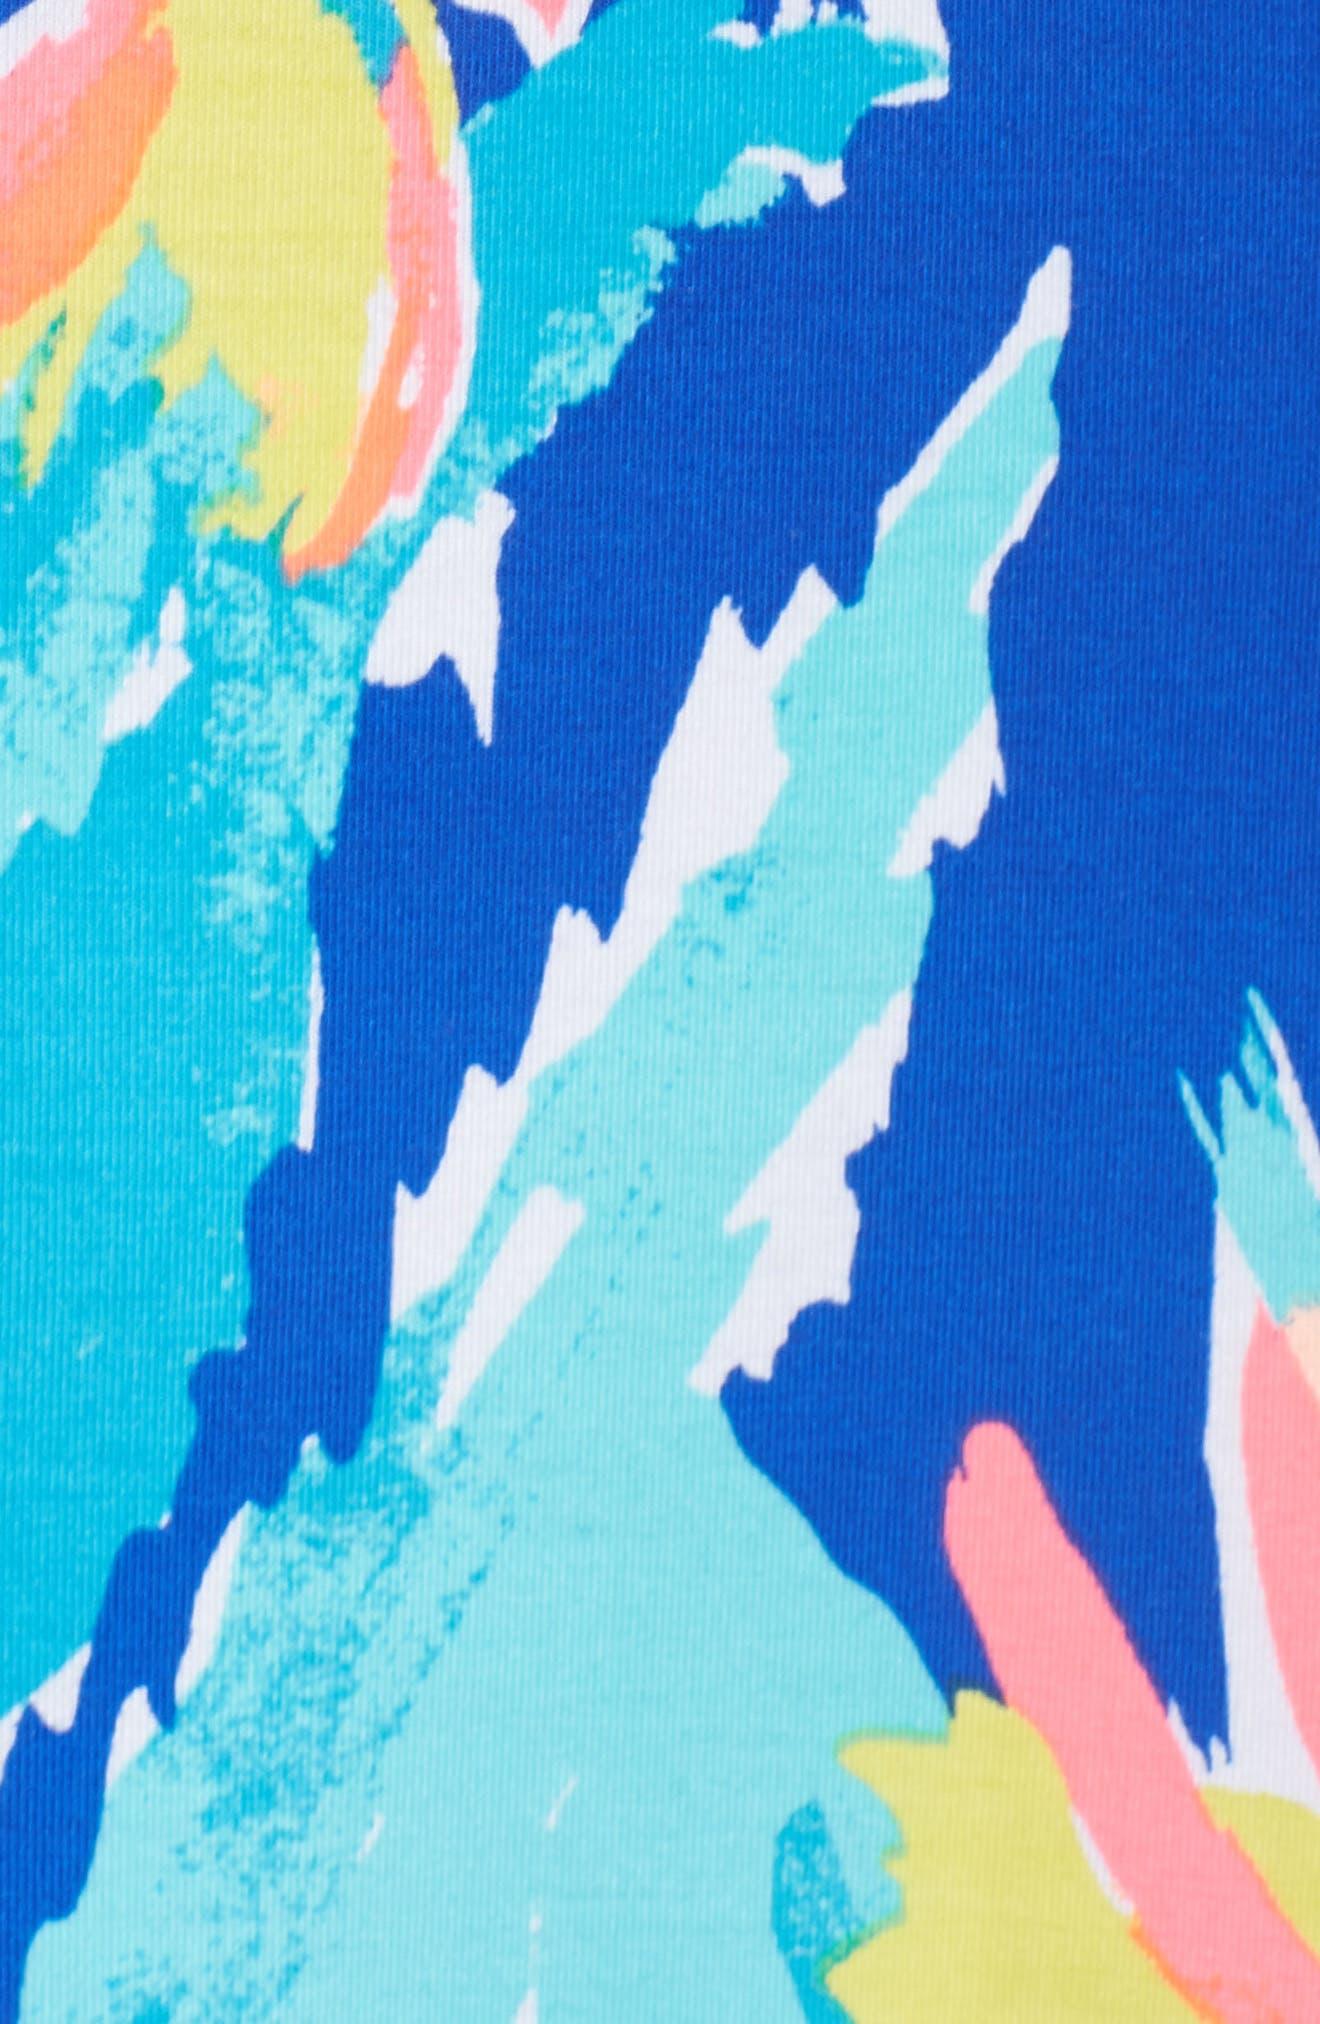 Natalia Maxi Dress,                             Alternate thumbnail 5, color,                             454